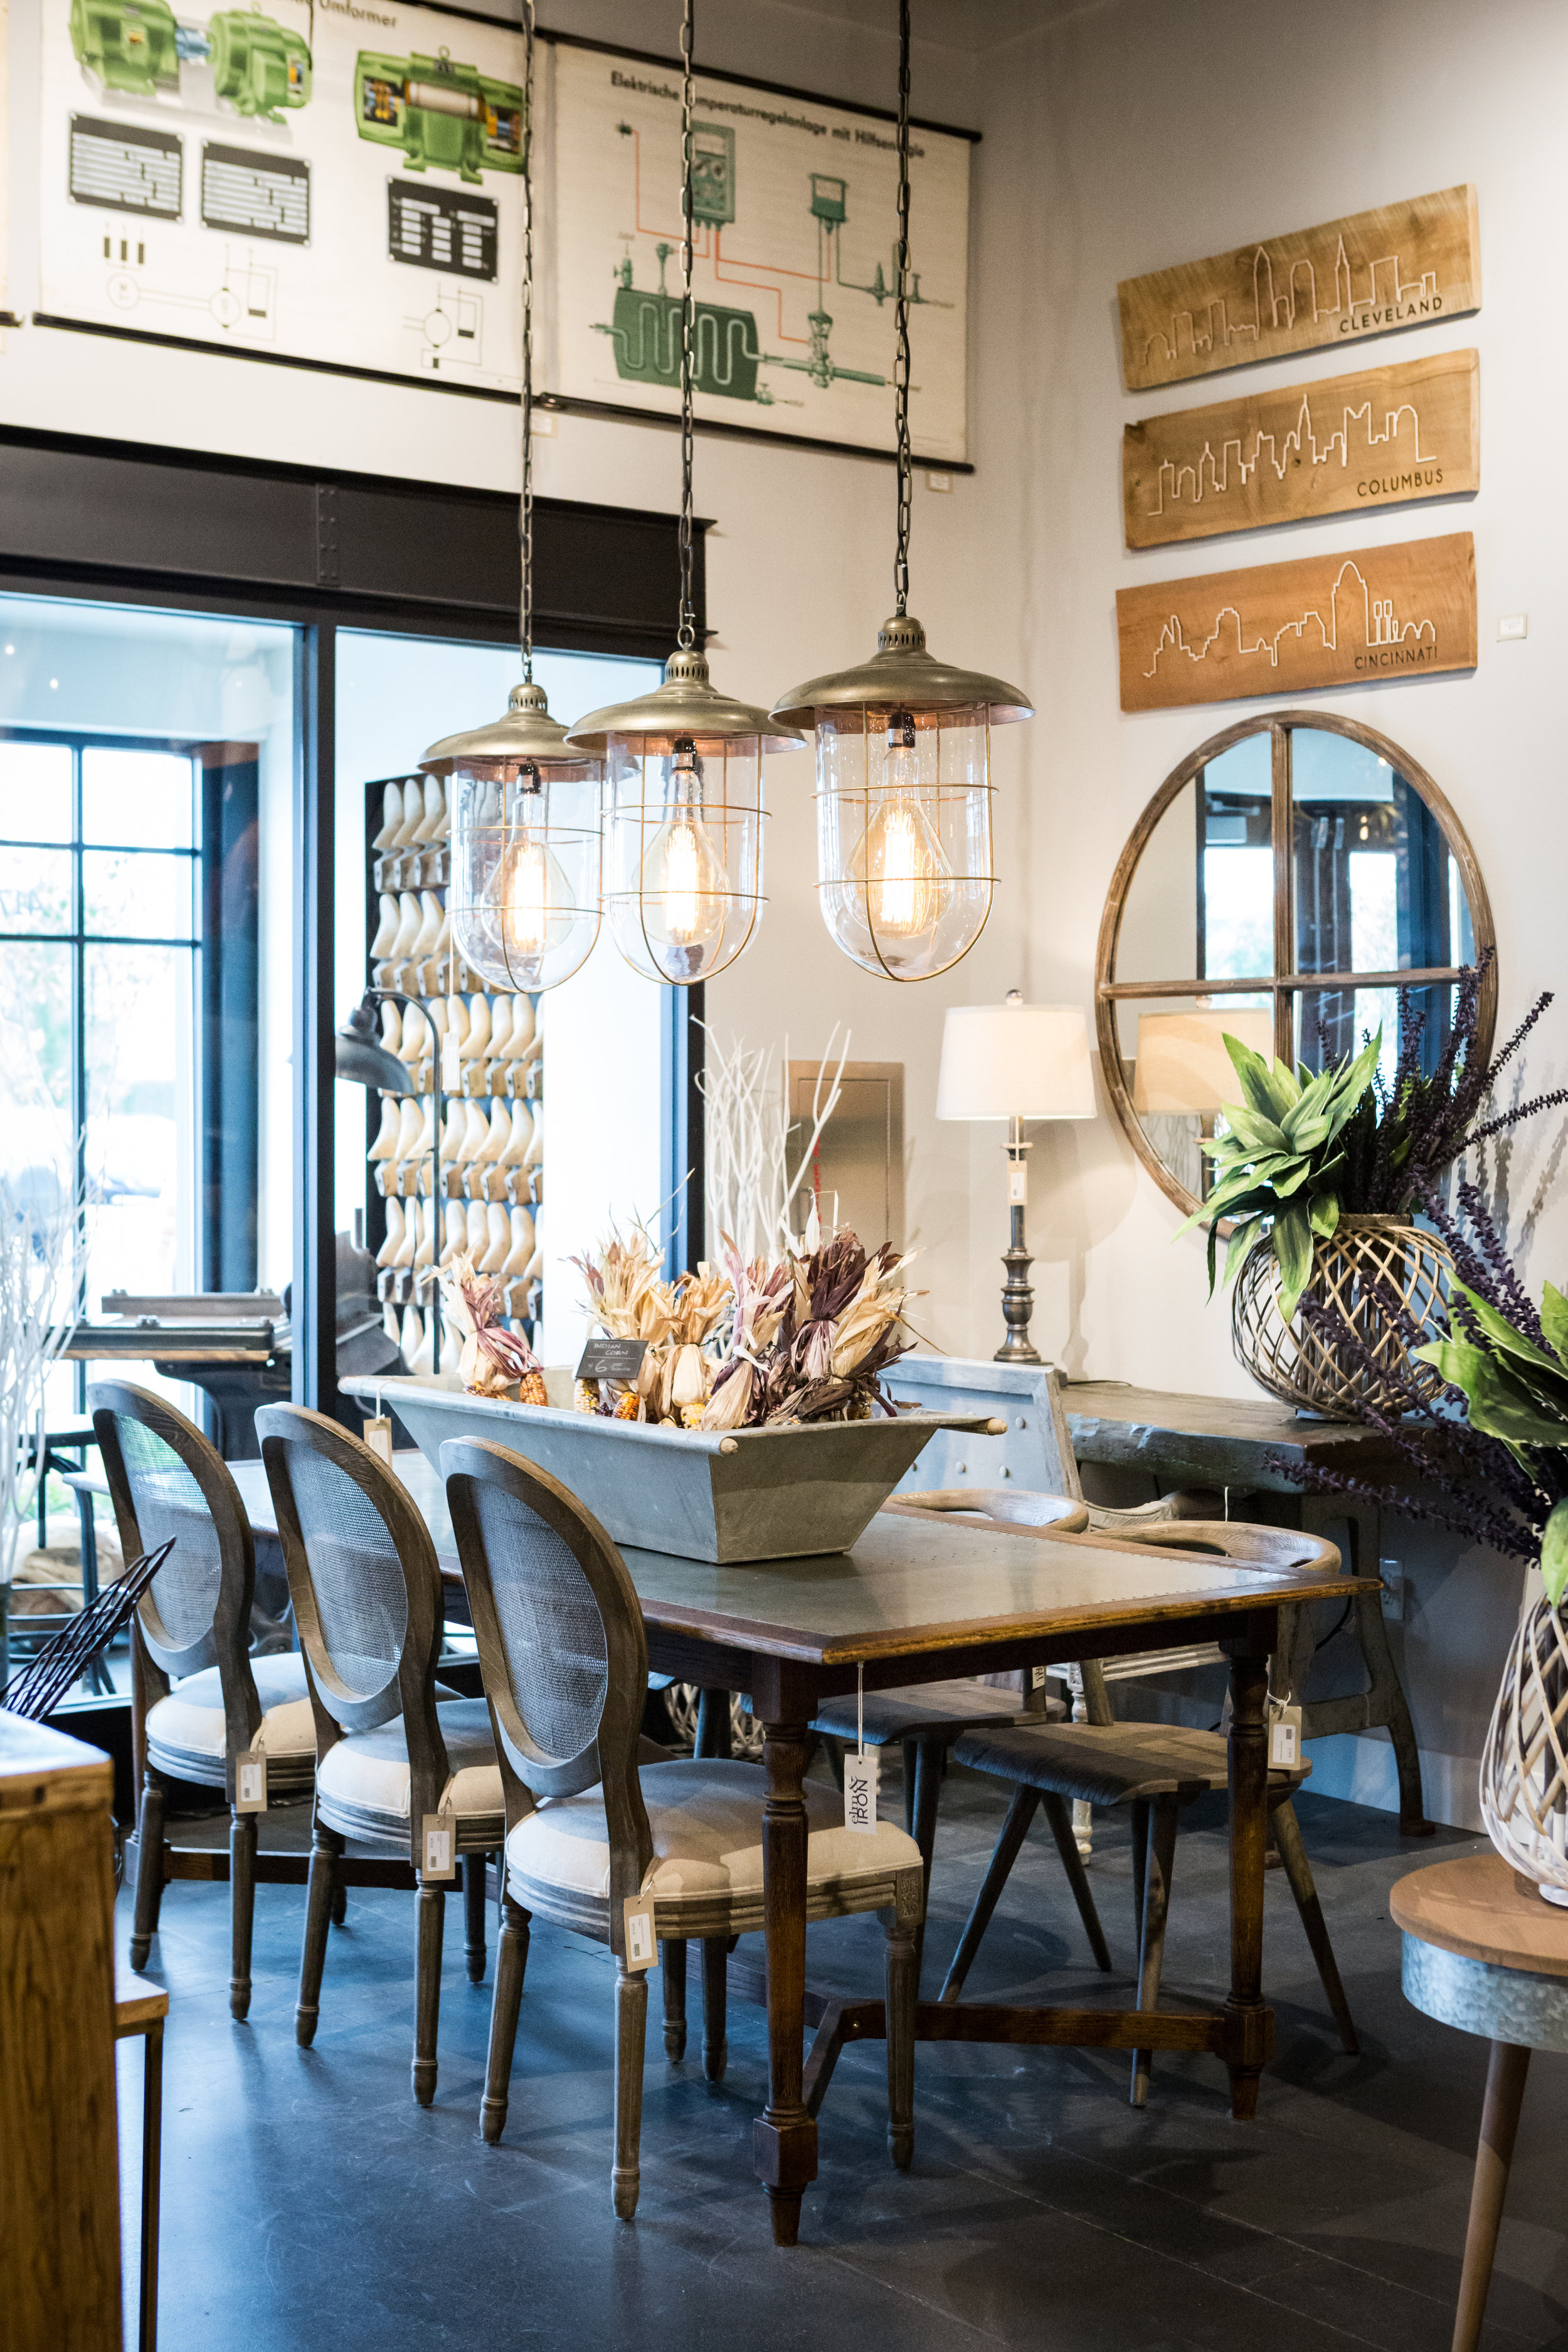 Sylvan Dining Table $1,499.00